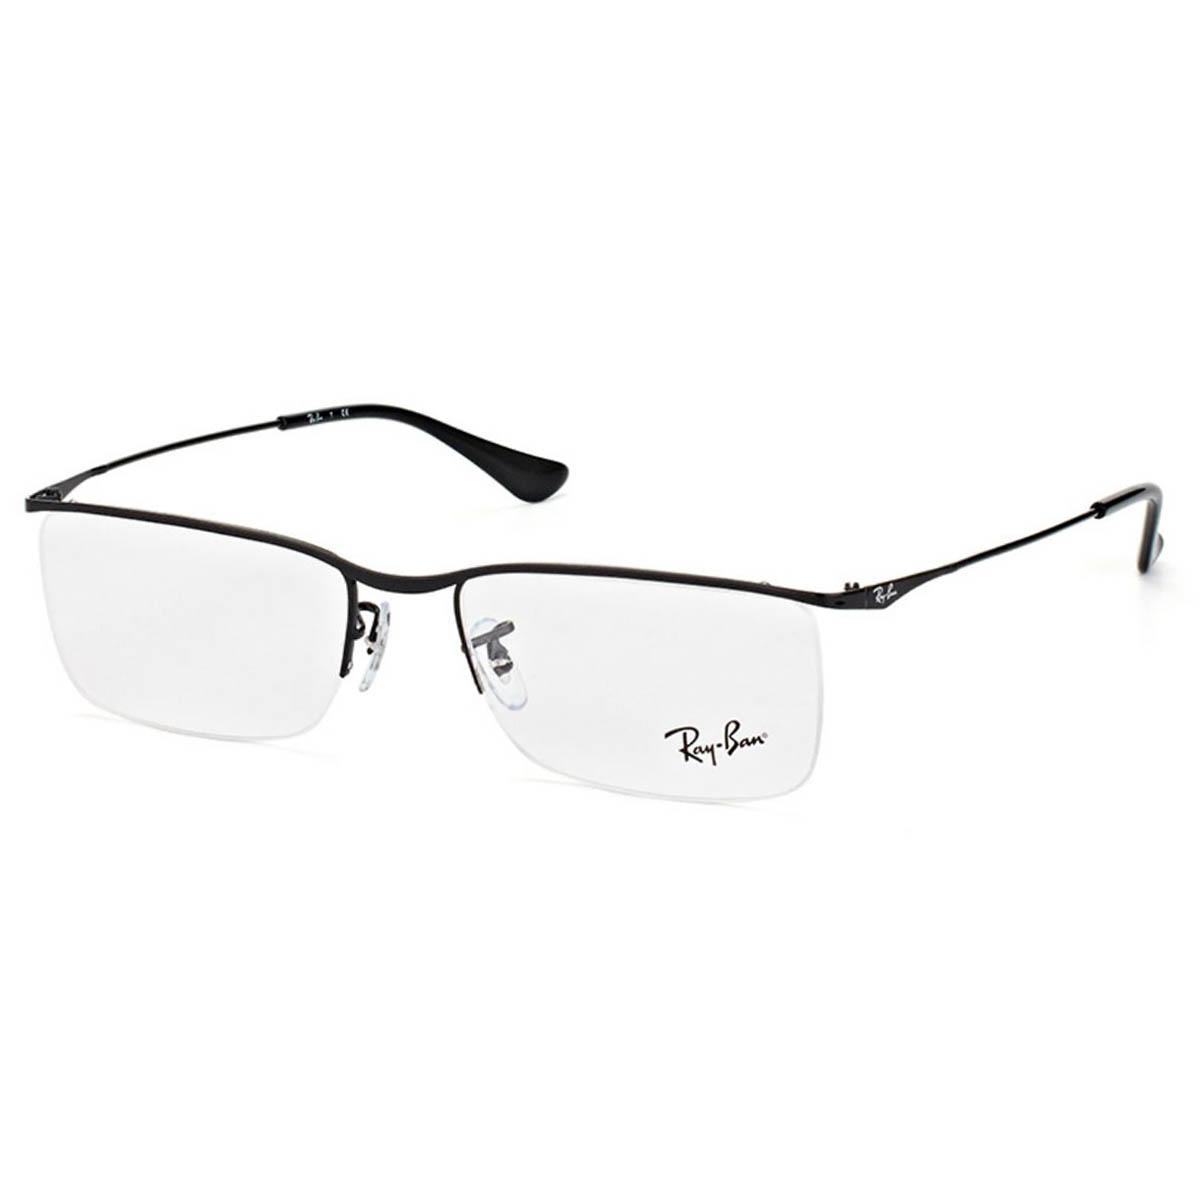 Óculos de Grau Ray Ban RX6370 Preto Brilho Retangular Masculino